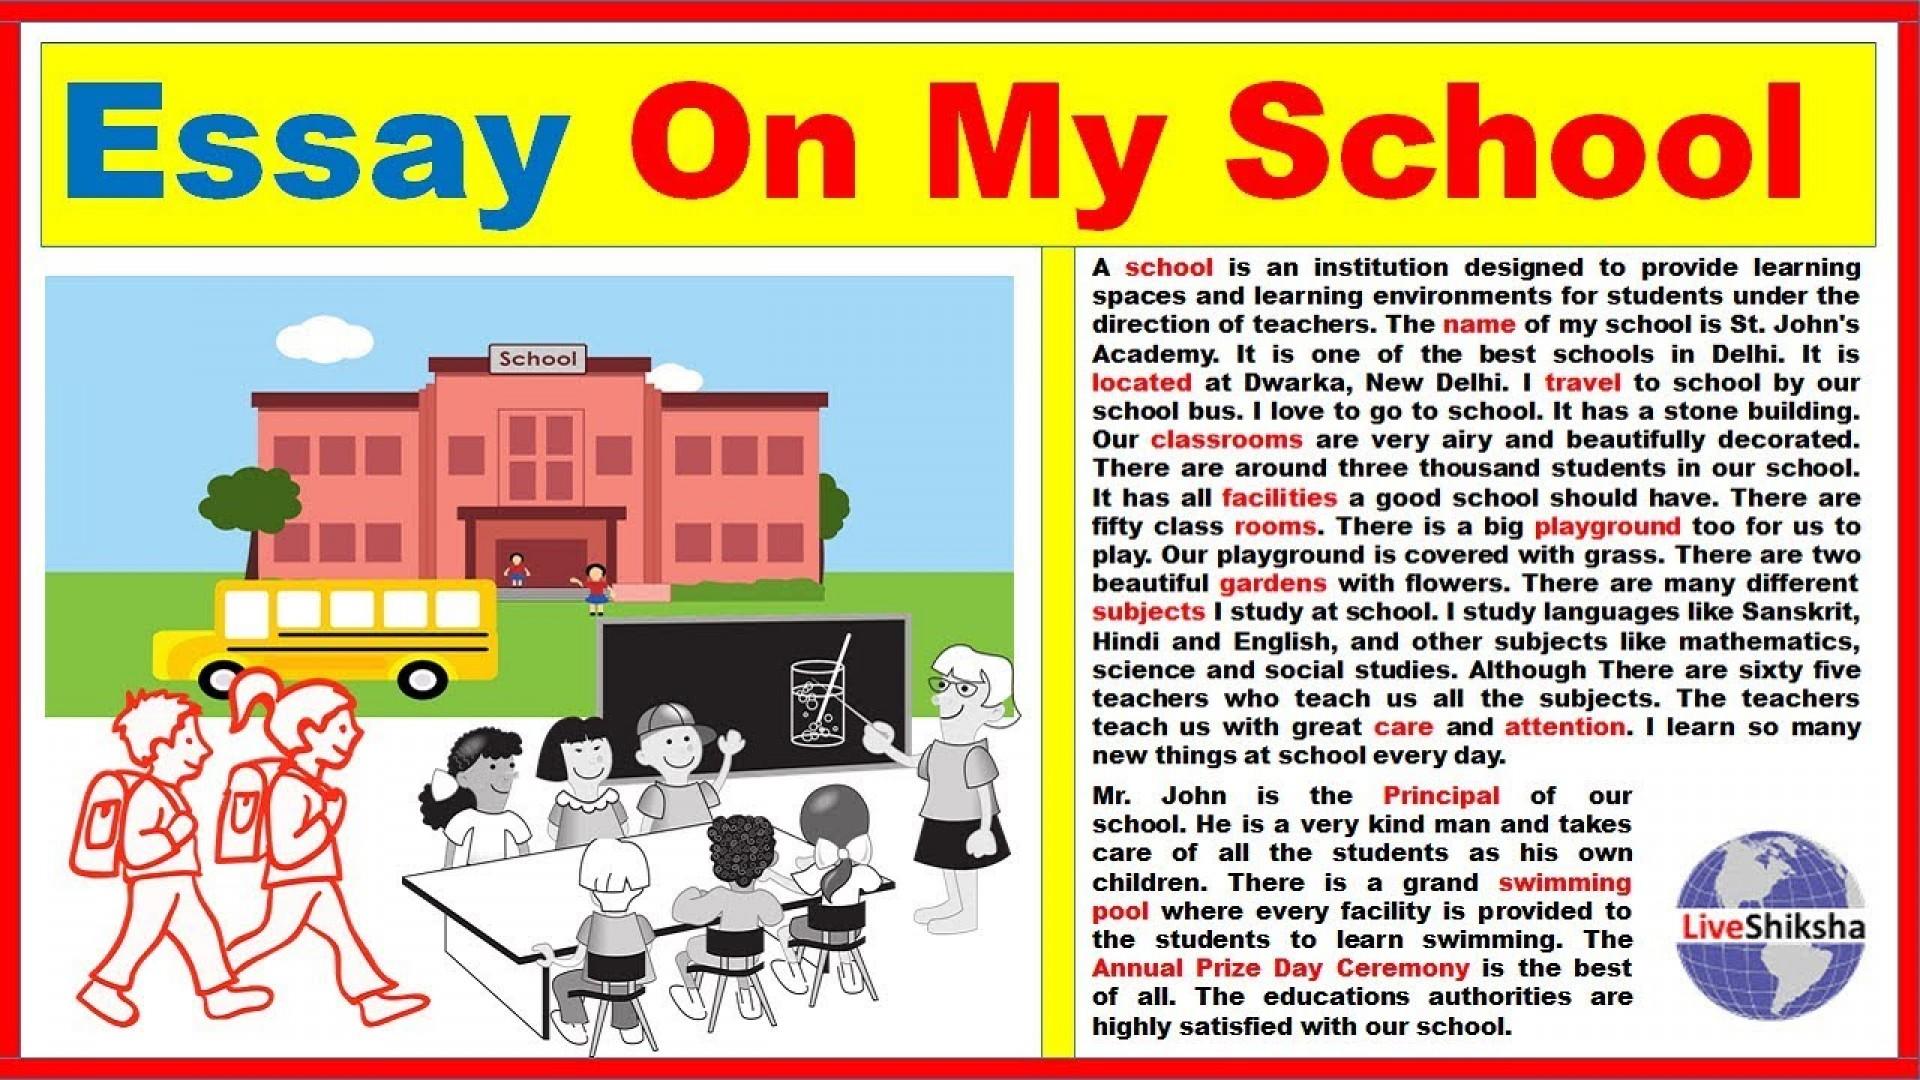 006 My School Essay Maxresdefault Amazing Dream For Class 10 In Urdu 1 3 Marathi 1920